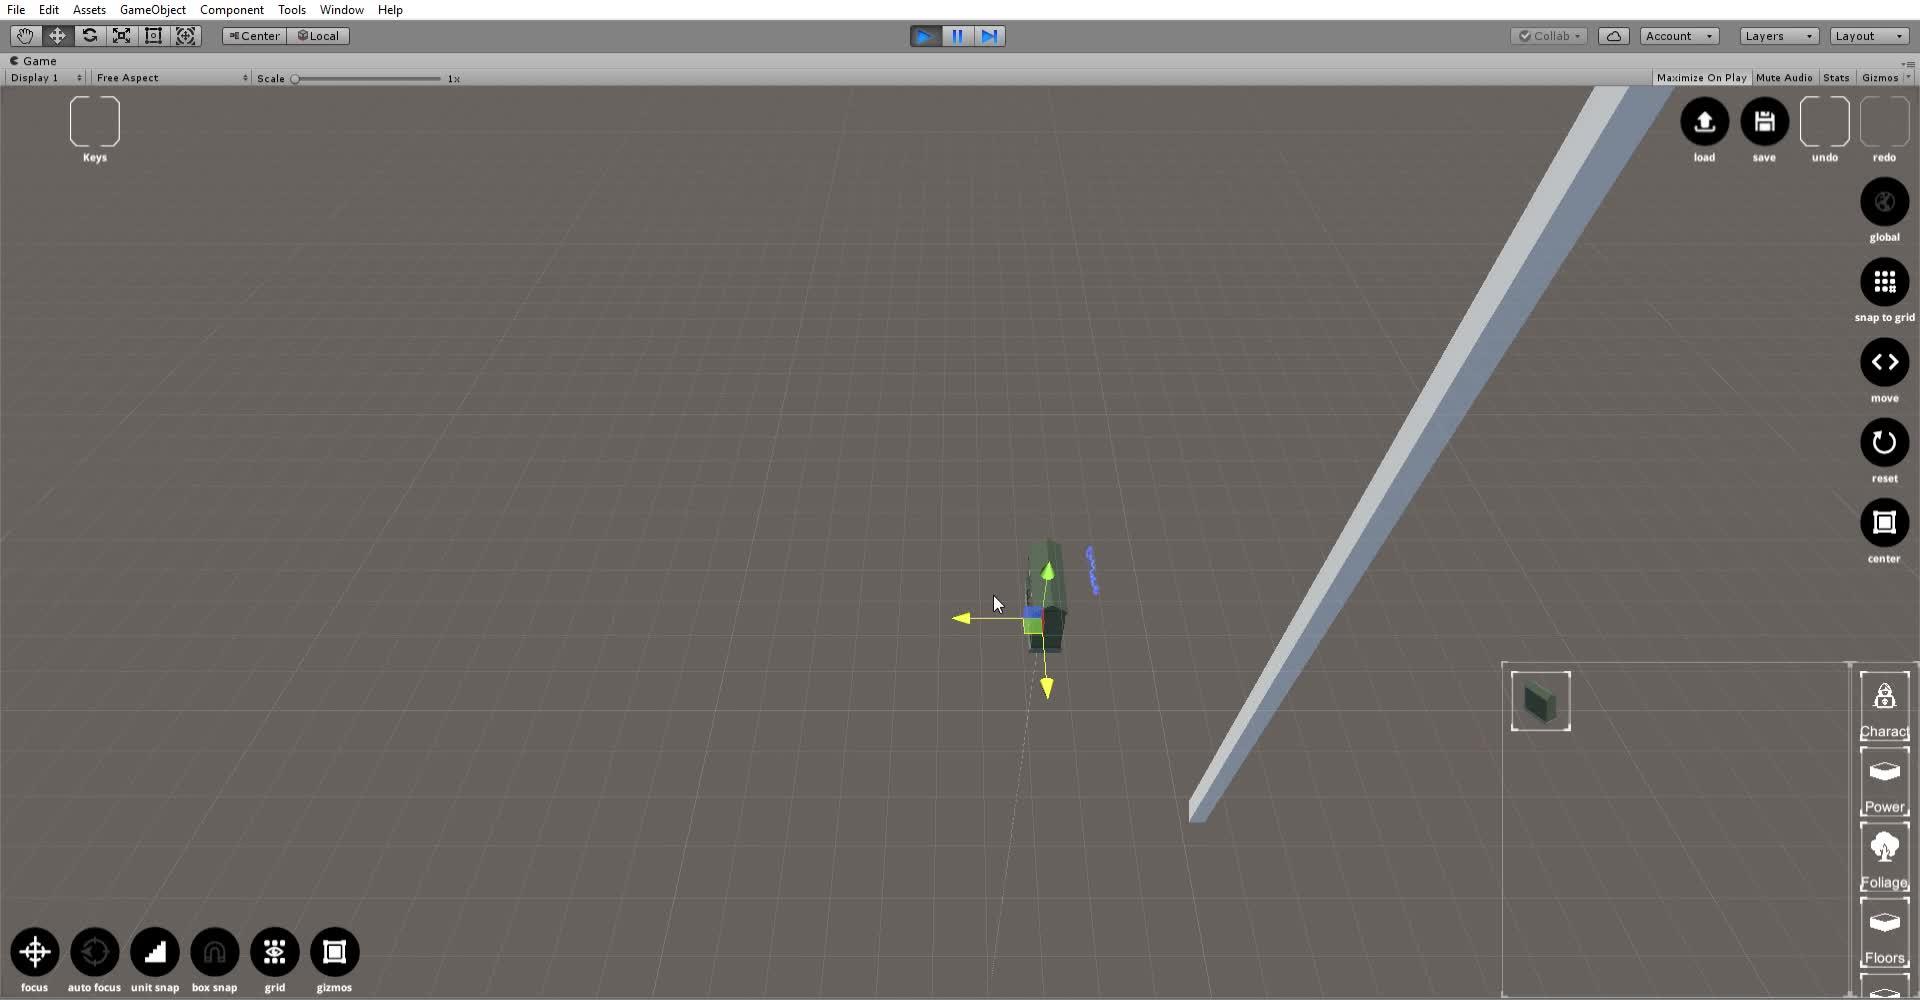 Unity 2018 2 17 F 1 Personal 64 Bit Level Editor Unity Clue PC Mac Linux  Standalone DX 11 02 02 2019 19 12 02